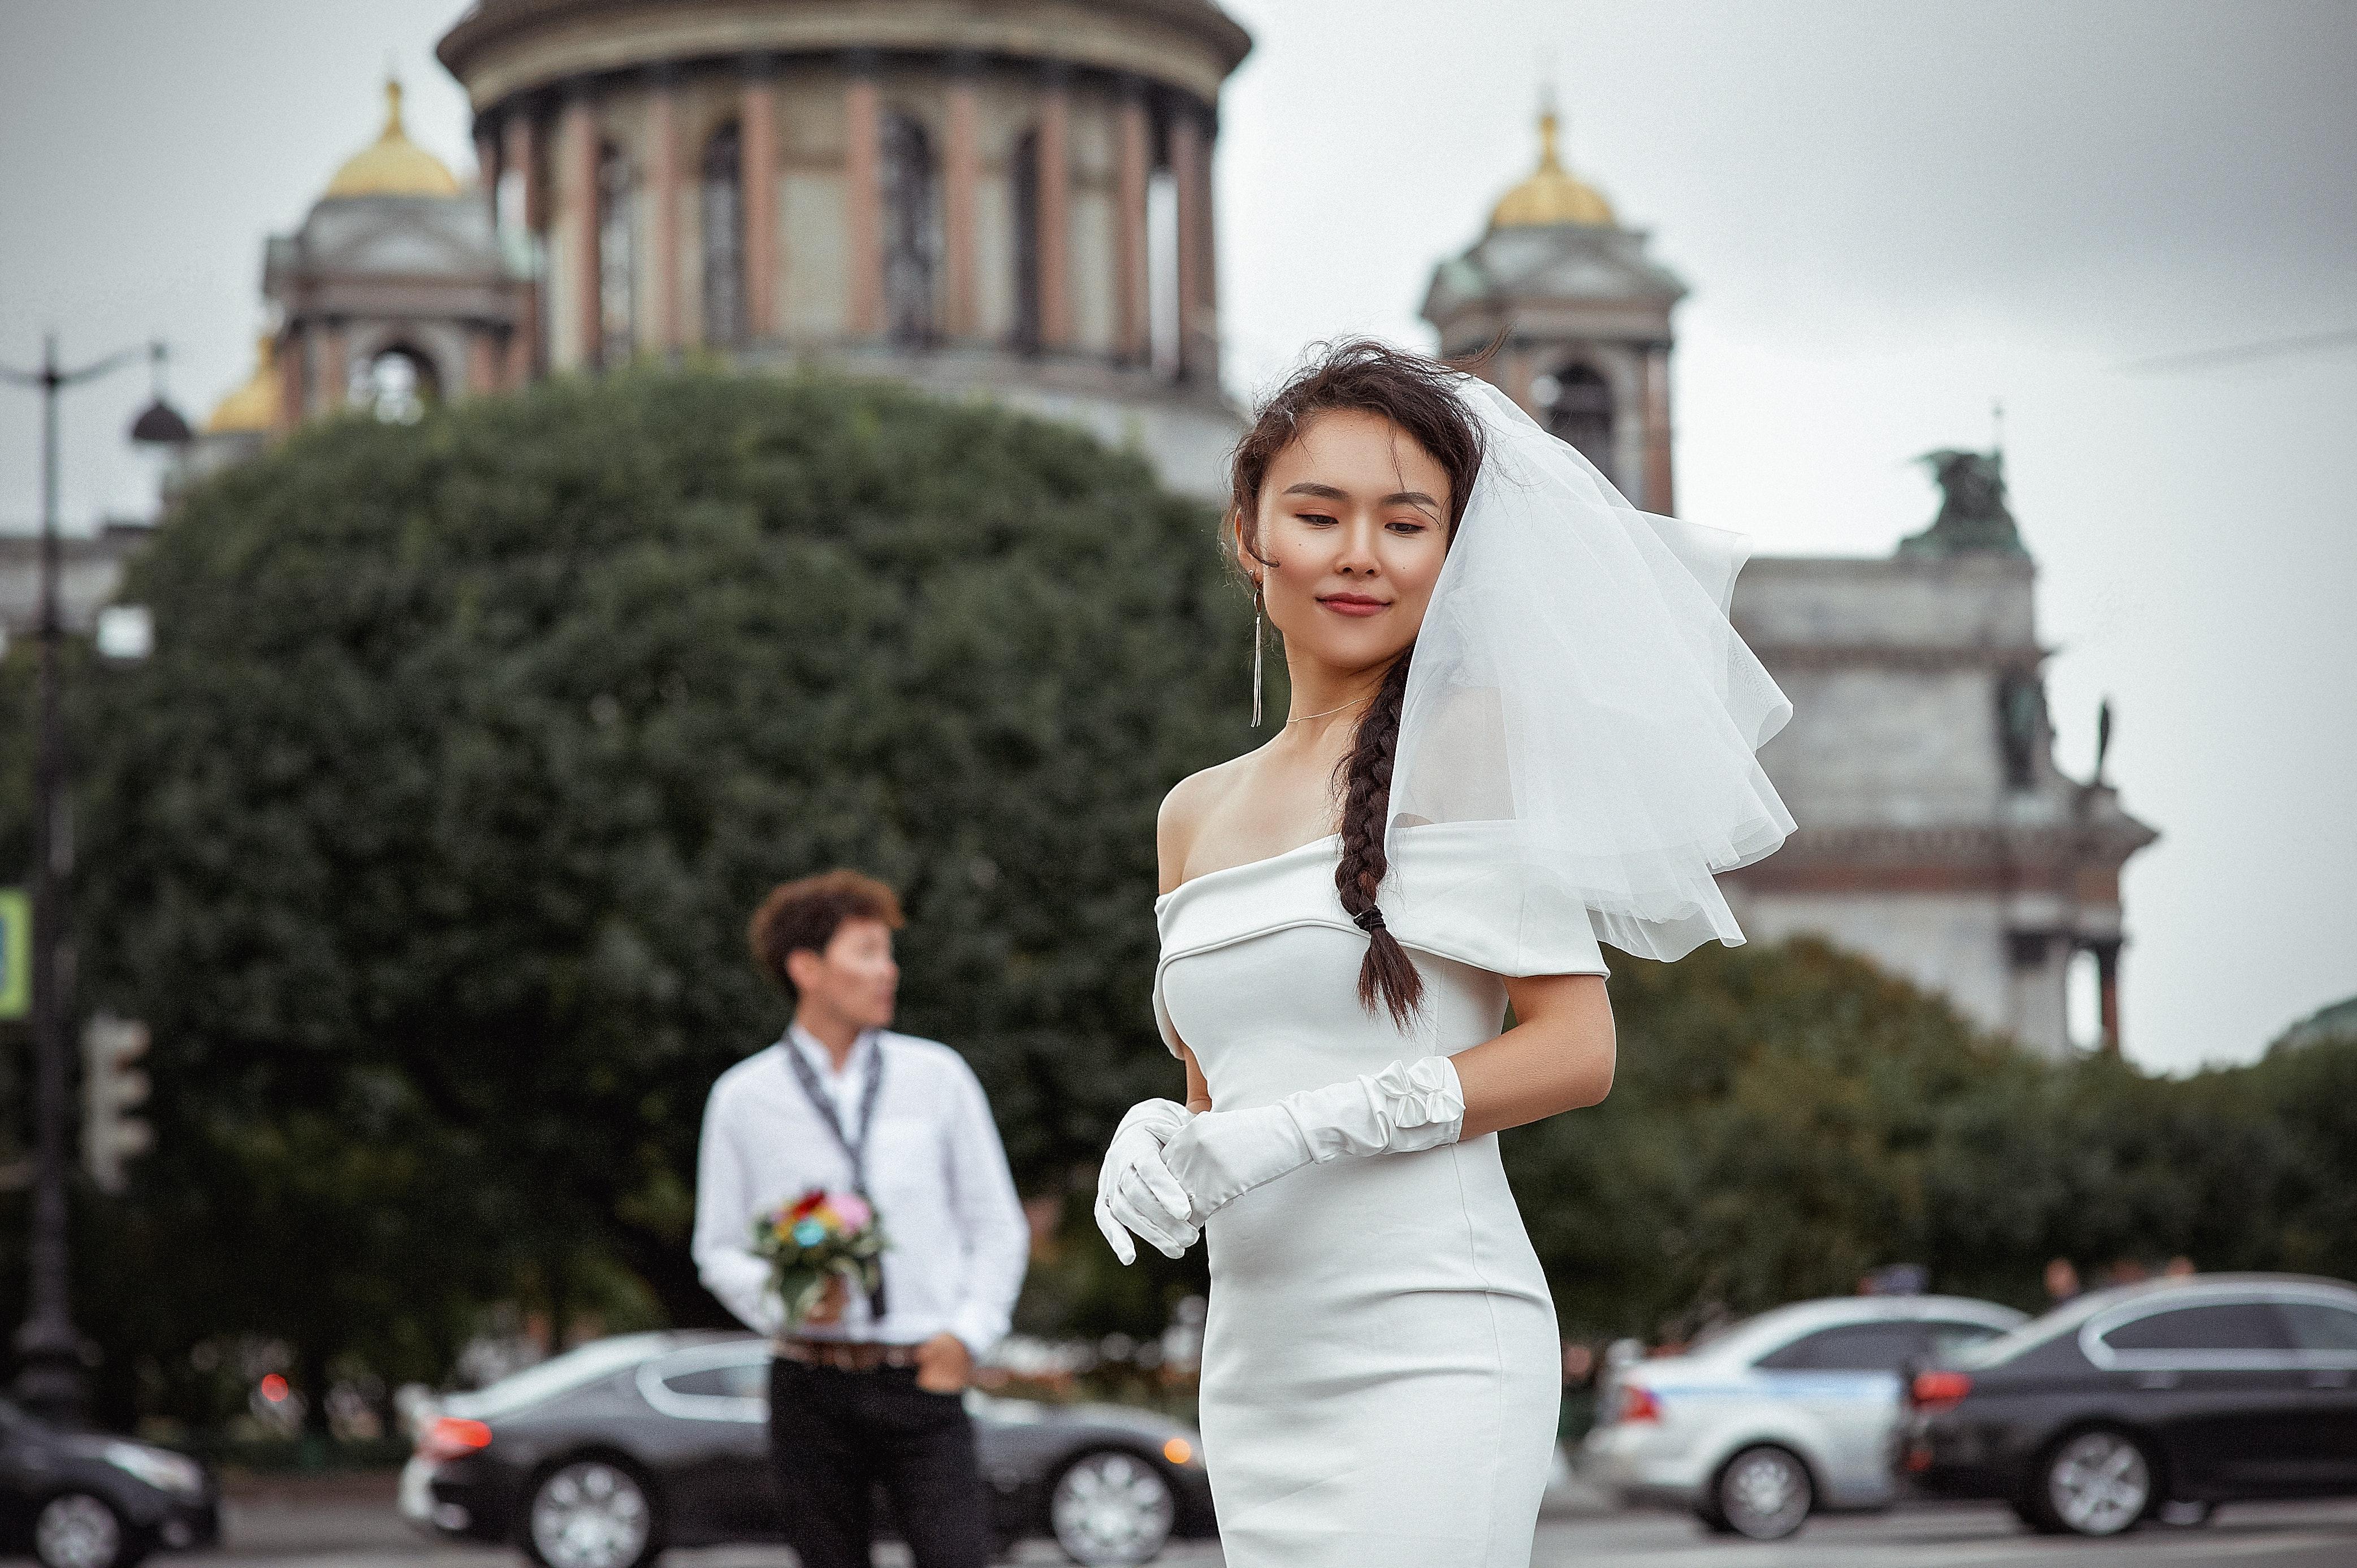 Modern Wedding Dress Styles for 2021